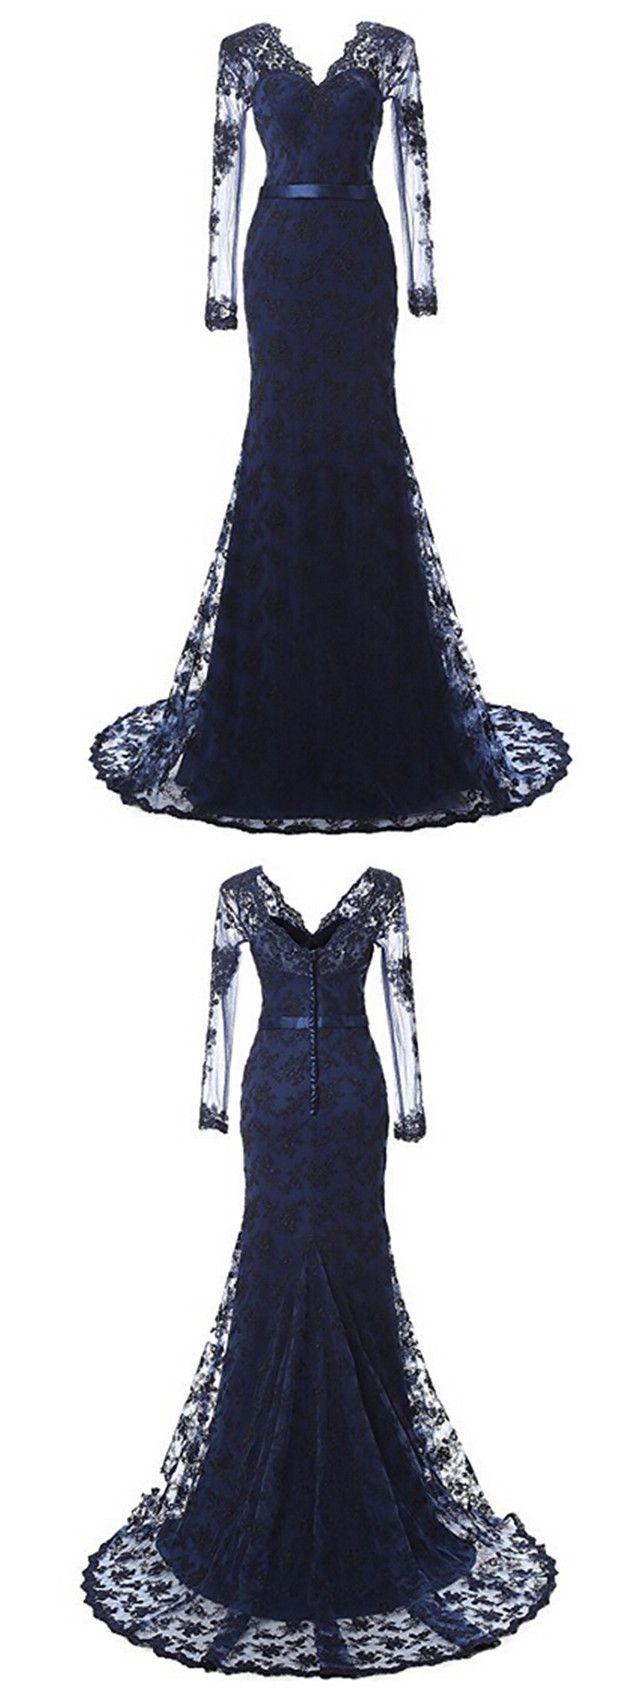 Womenus elegant mermaid prom dress lace and tulle pinterest